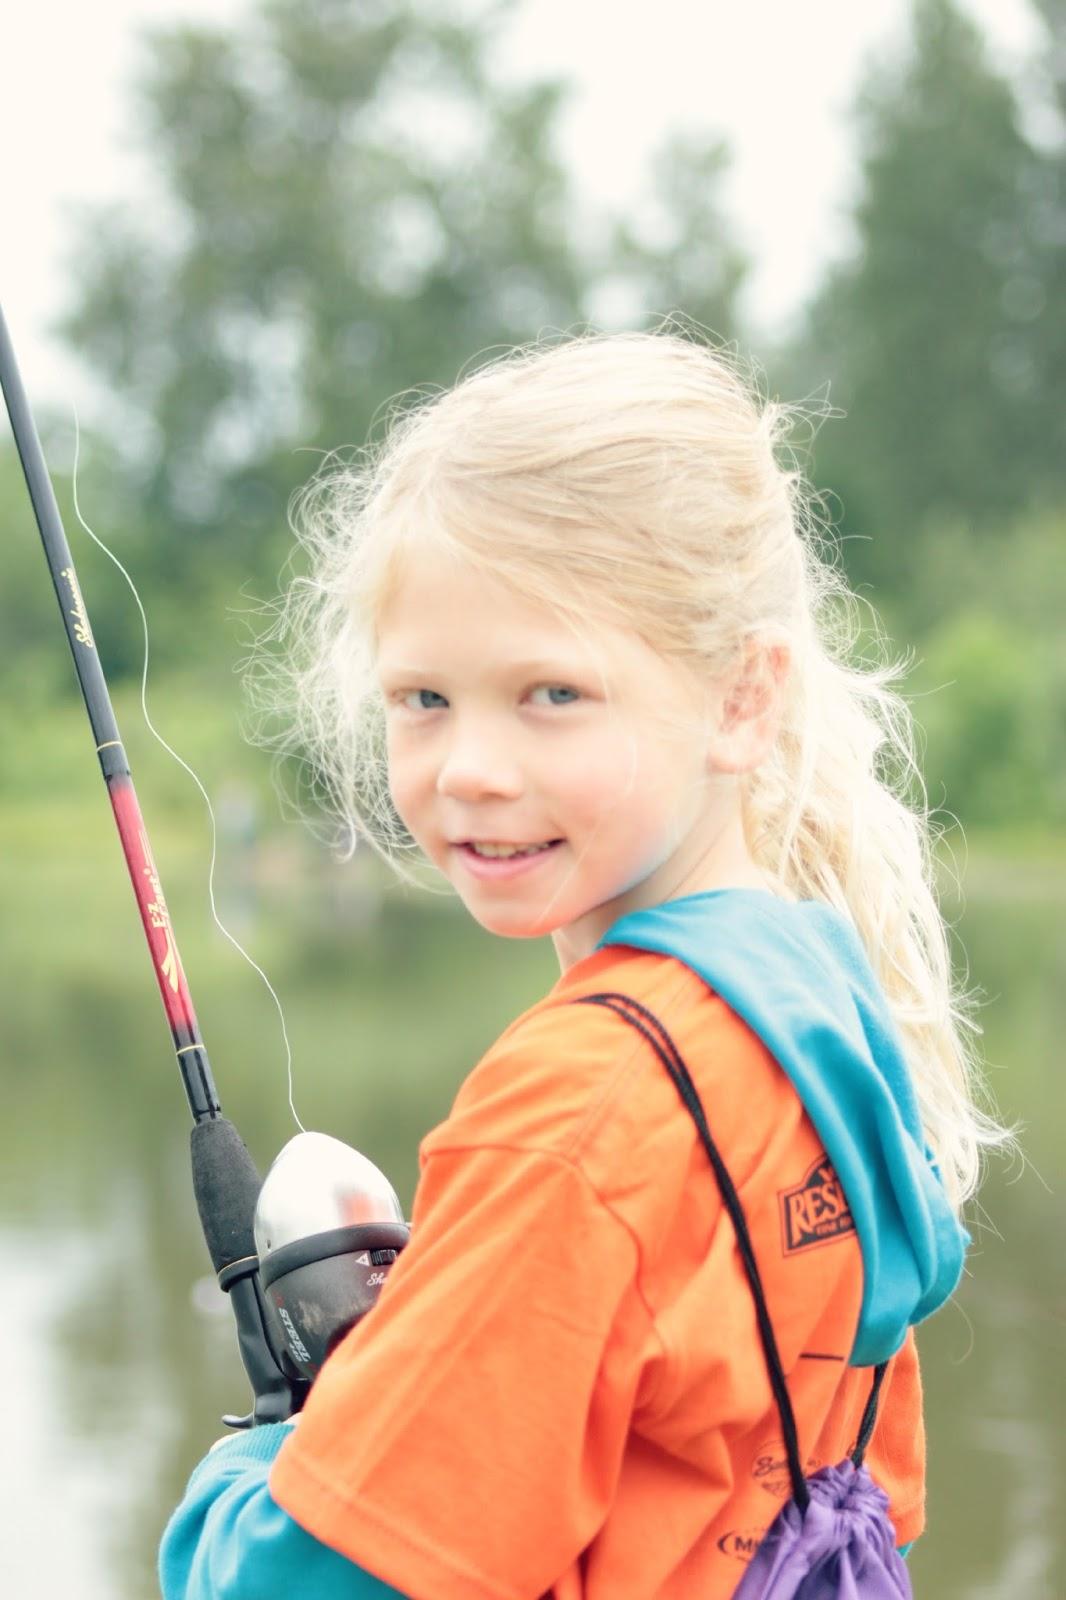 bd5cc-fishing2b2.jpg